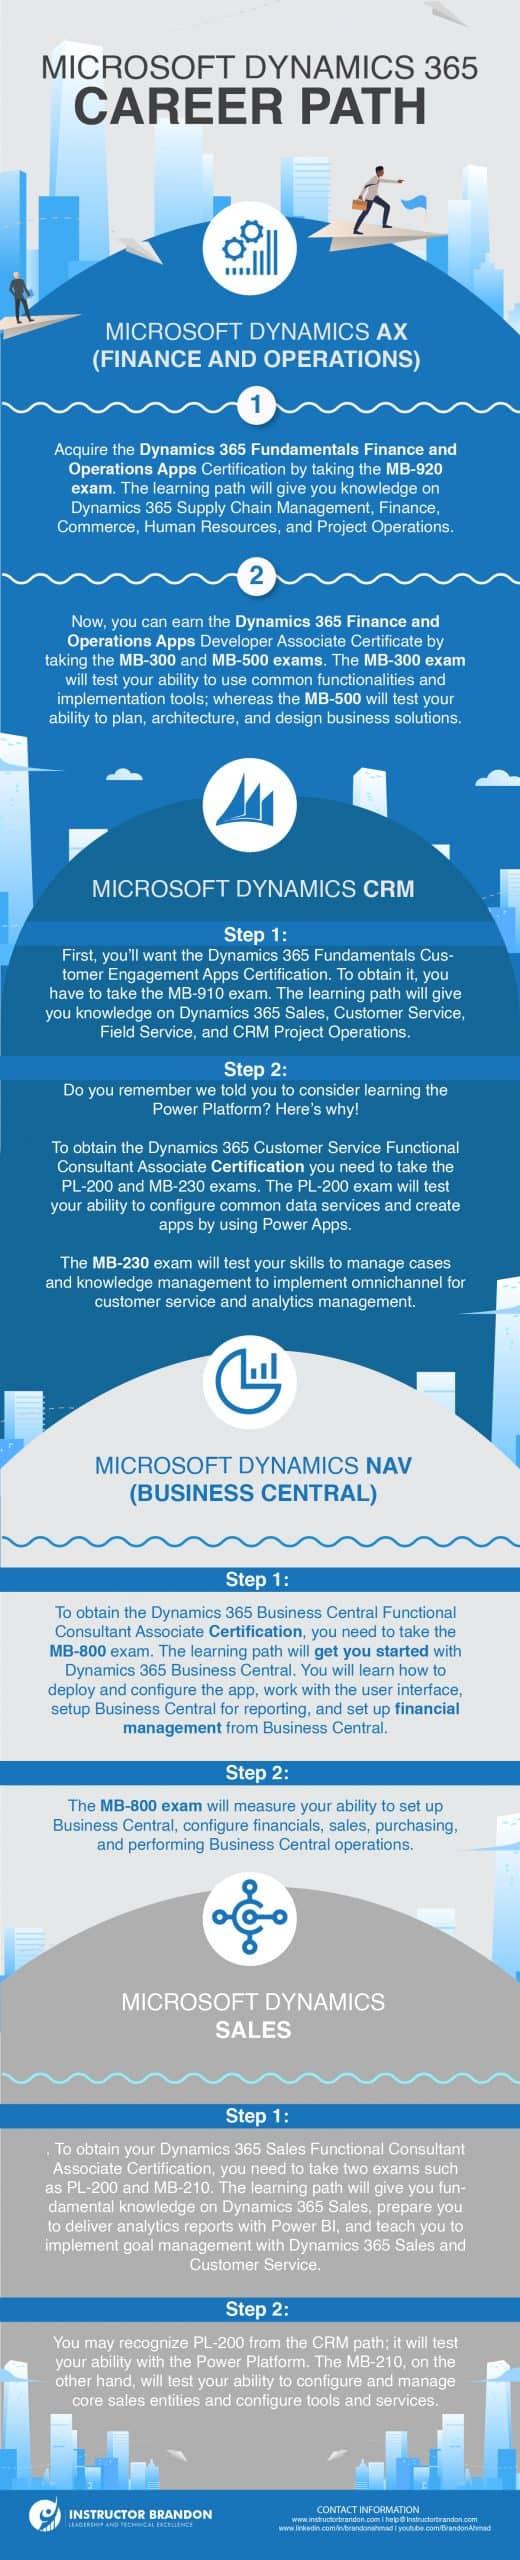 Microsoft Dynamics 365 Career Path